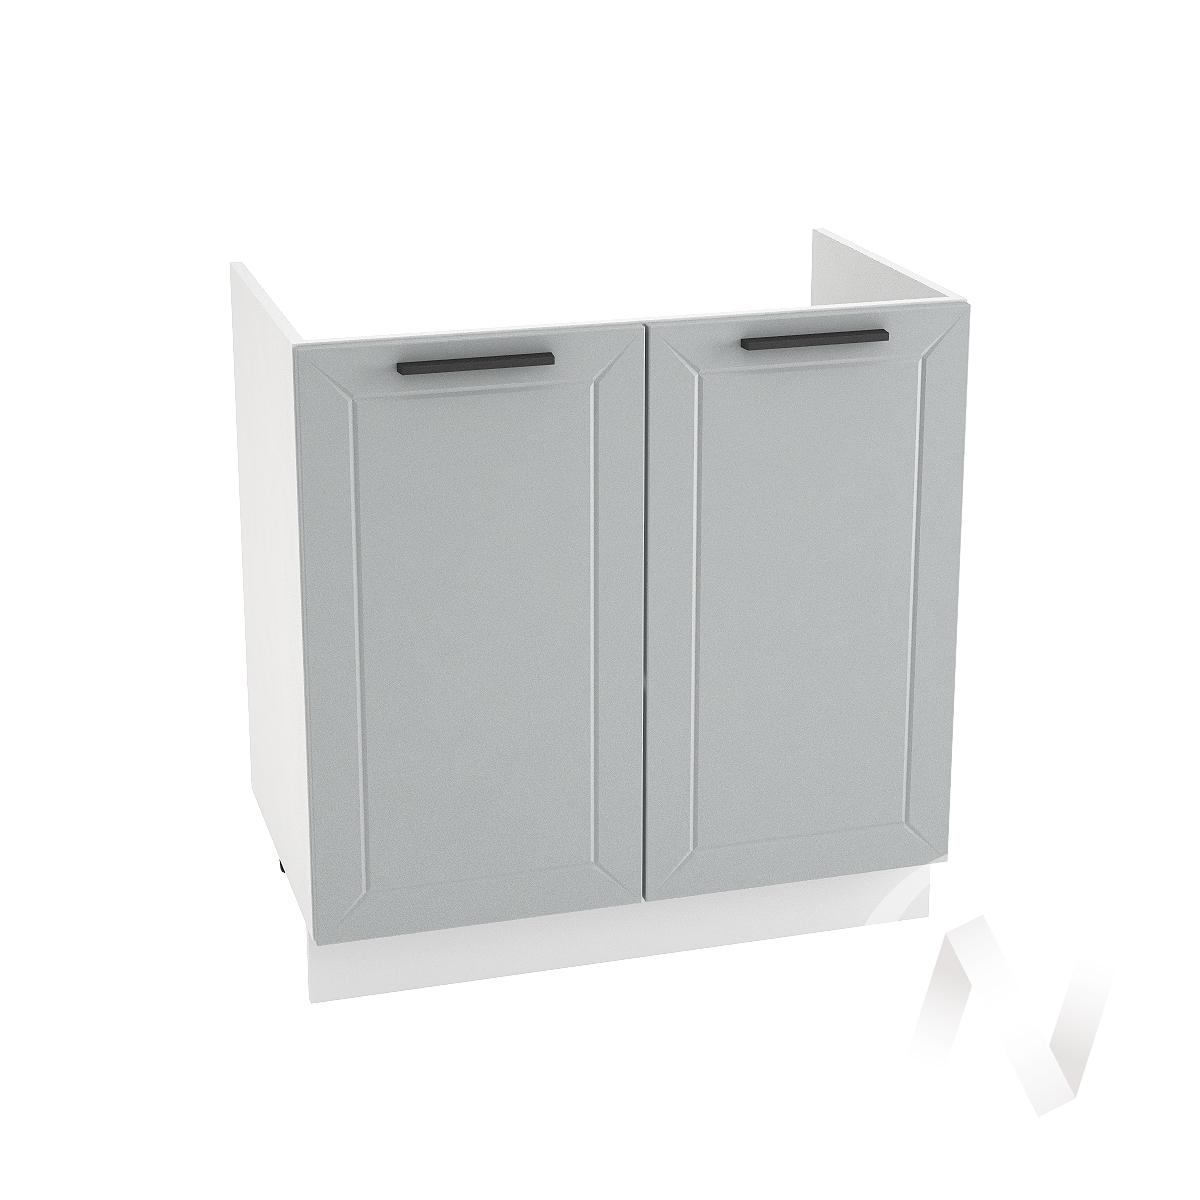 "Кухня ""Глетчер"": Шкаф нижний под мойку 800, ШНМ 800 (Гейнсборо Силк/корпус белый)"